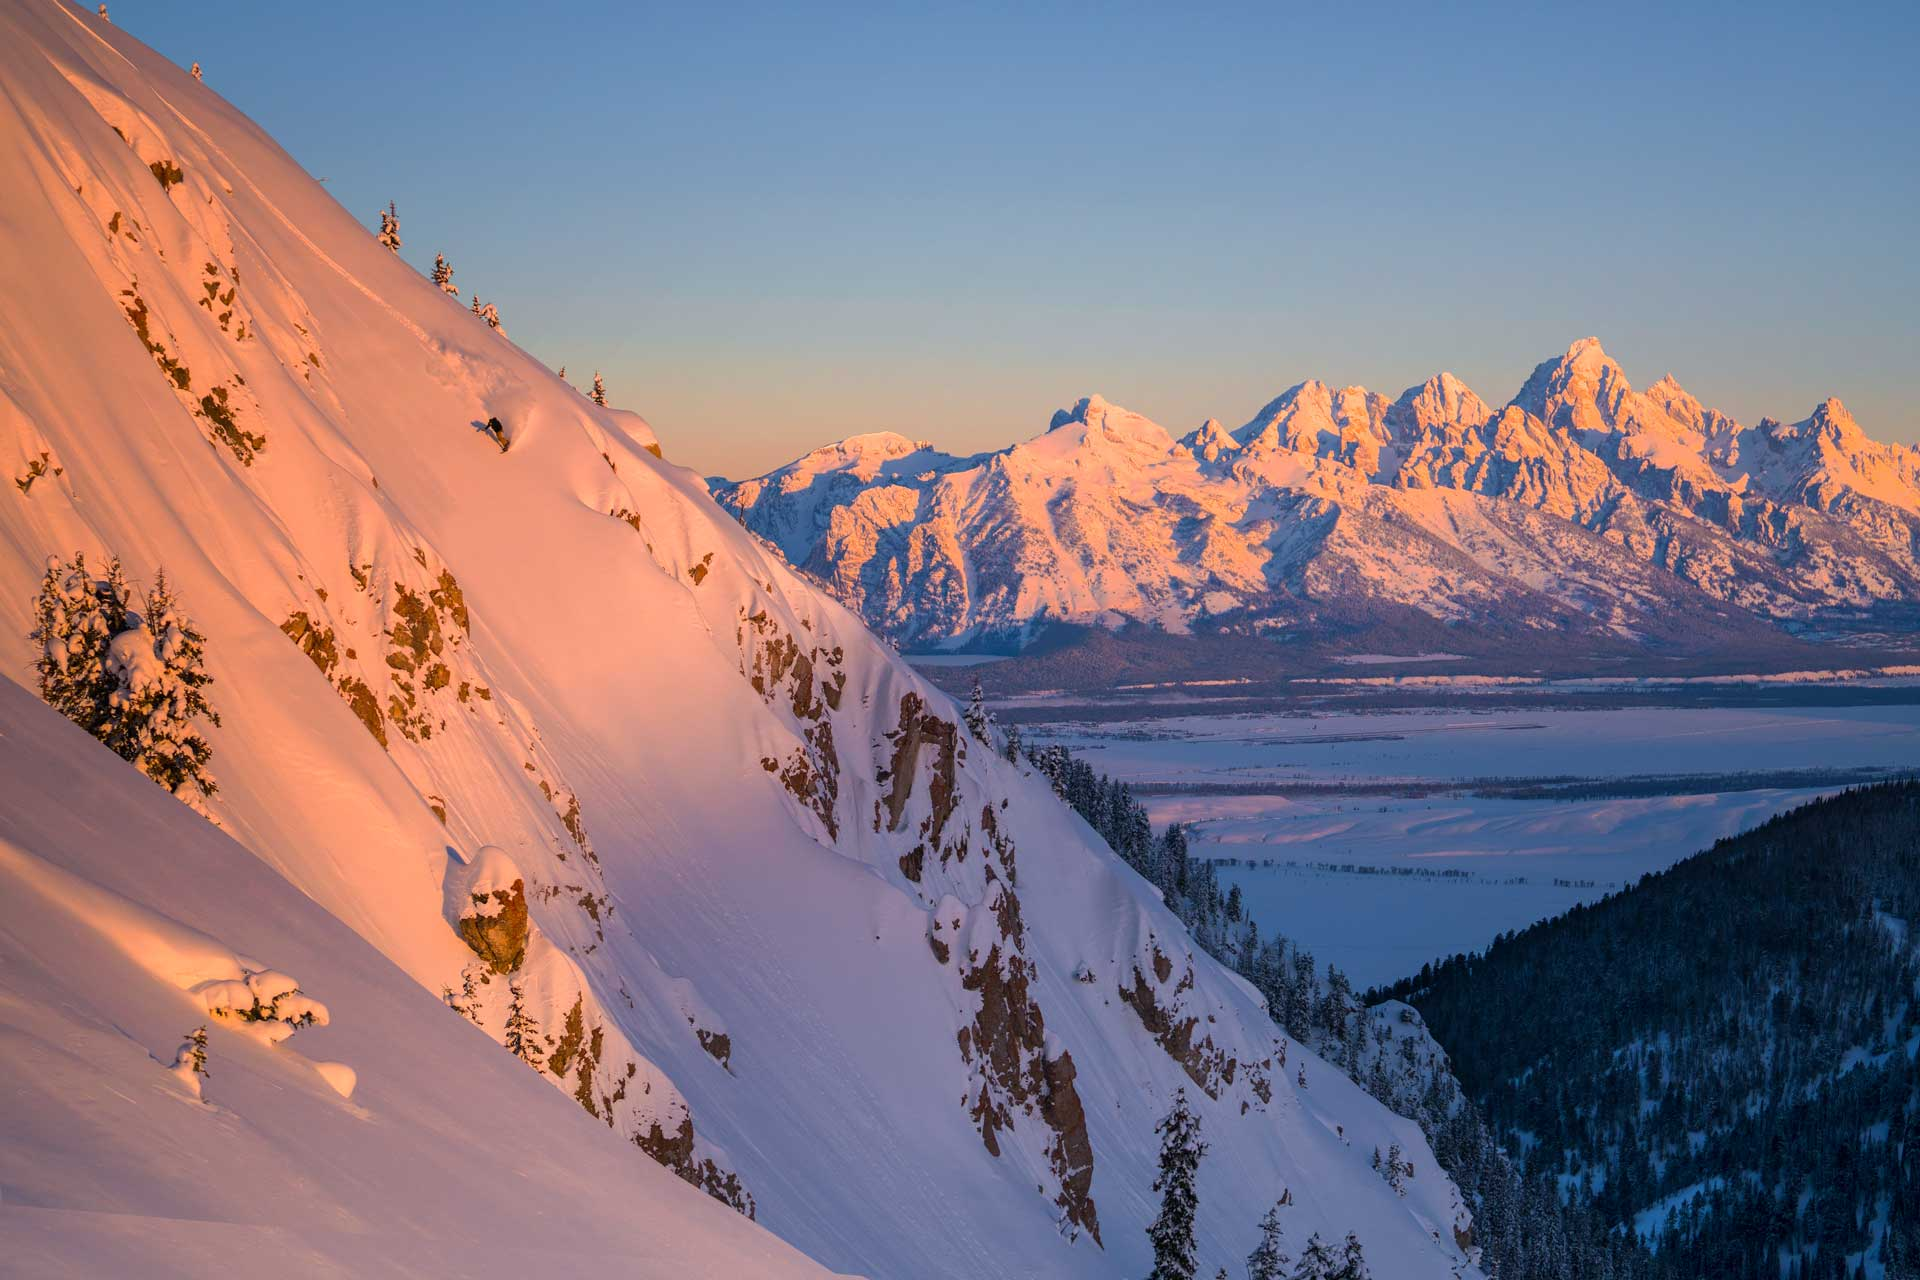 Snowboarder riding down mountain with the Grand Teton mountain range in the background.